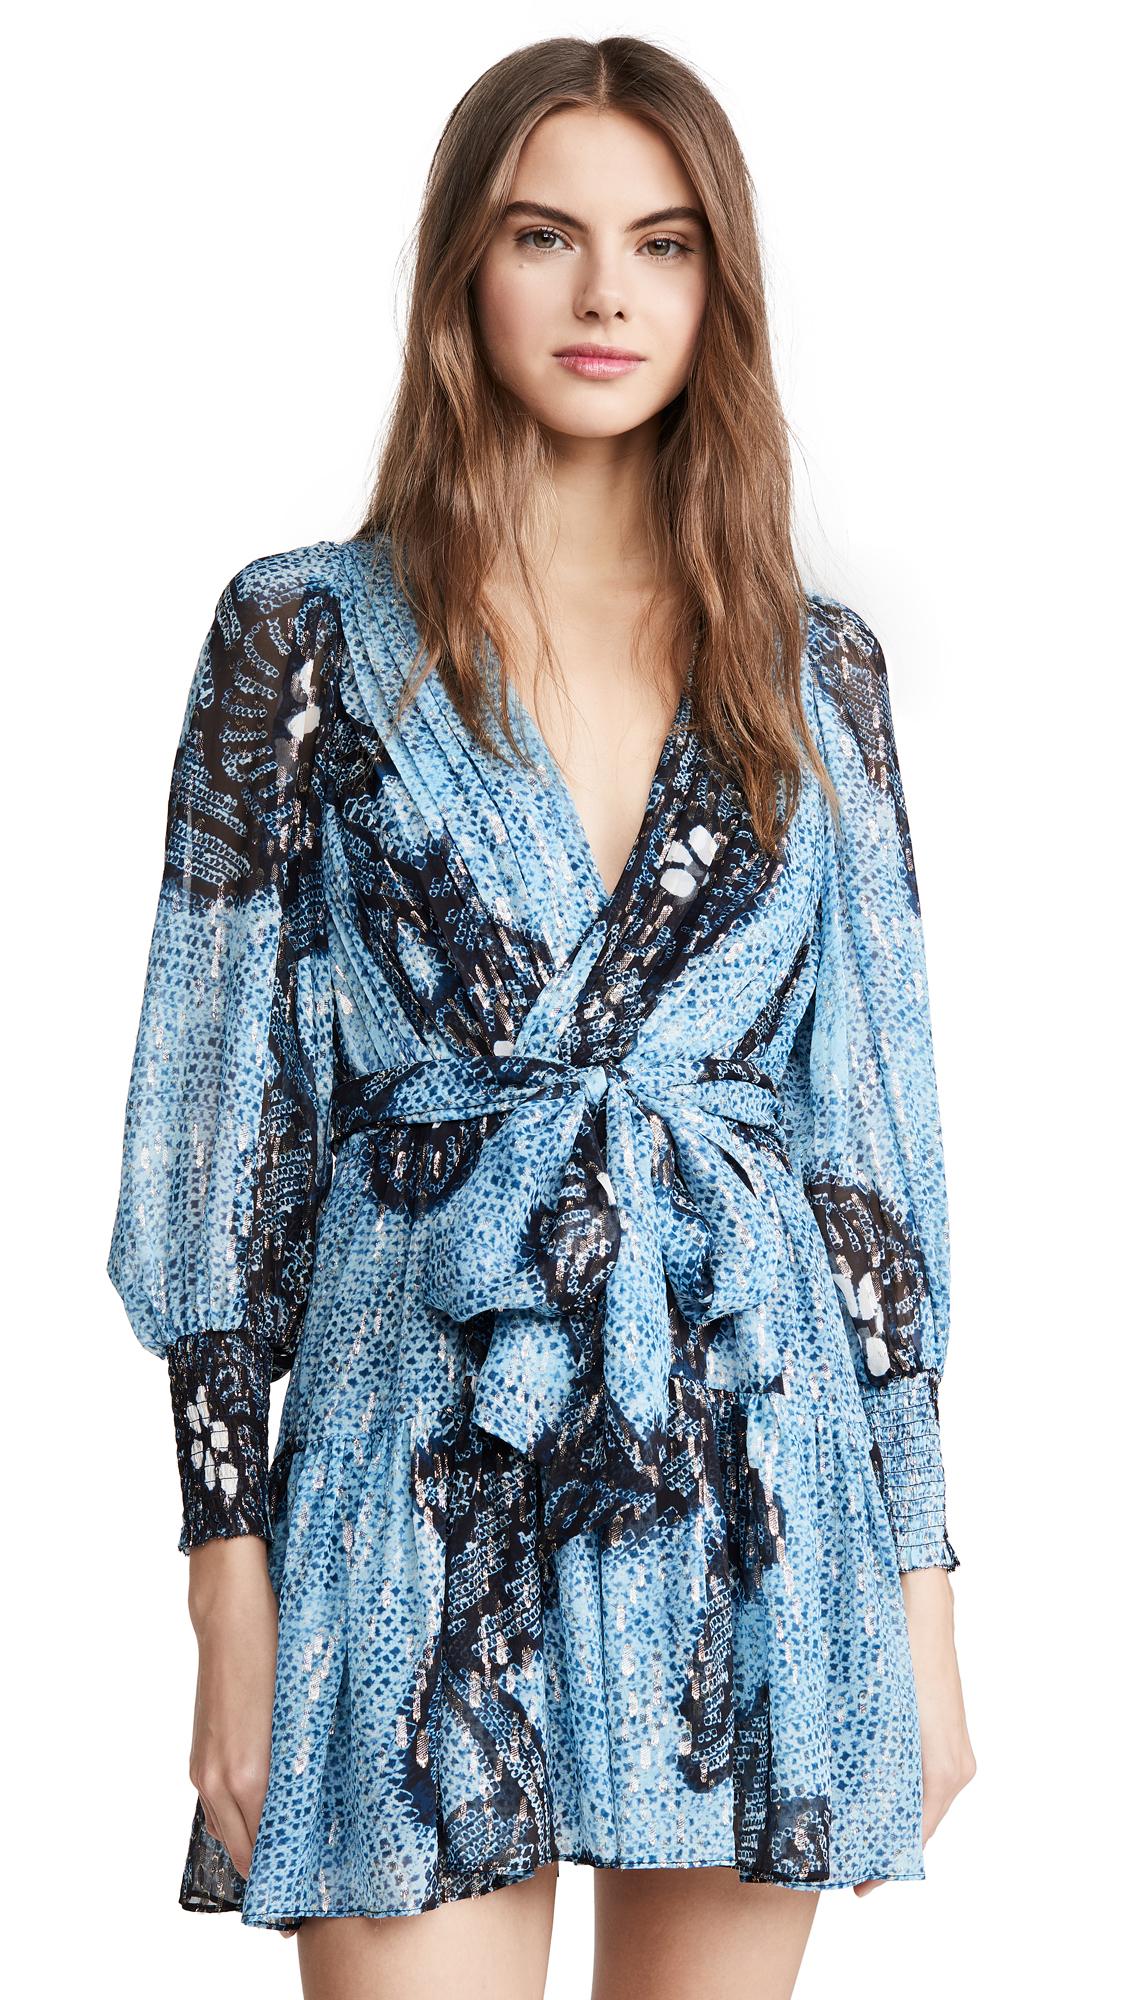 Ulla Johnson Noemi Silk Dress - 50% Off Sale